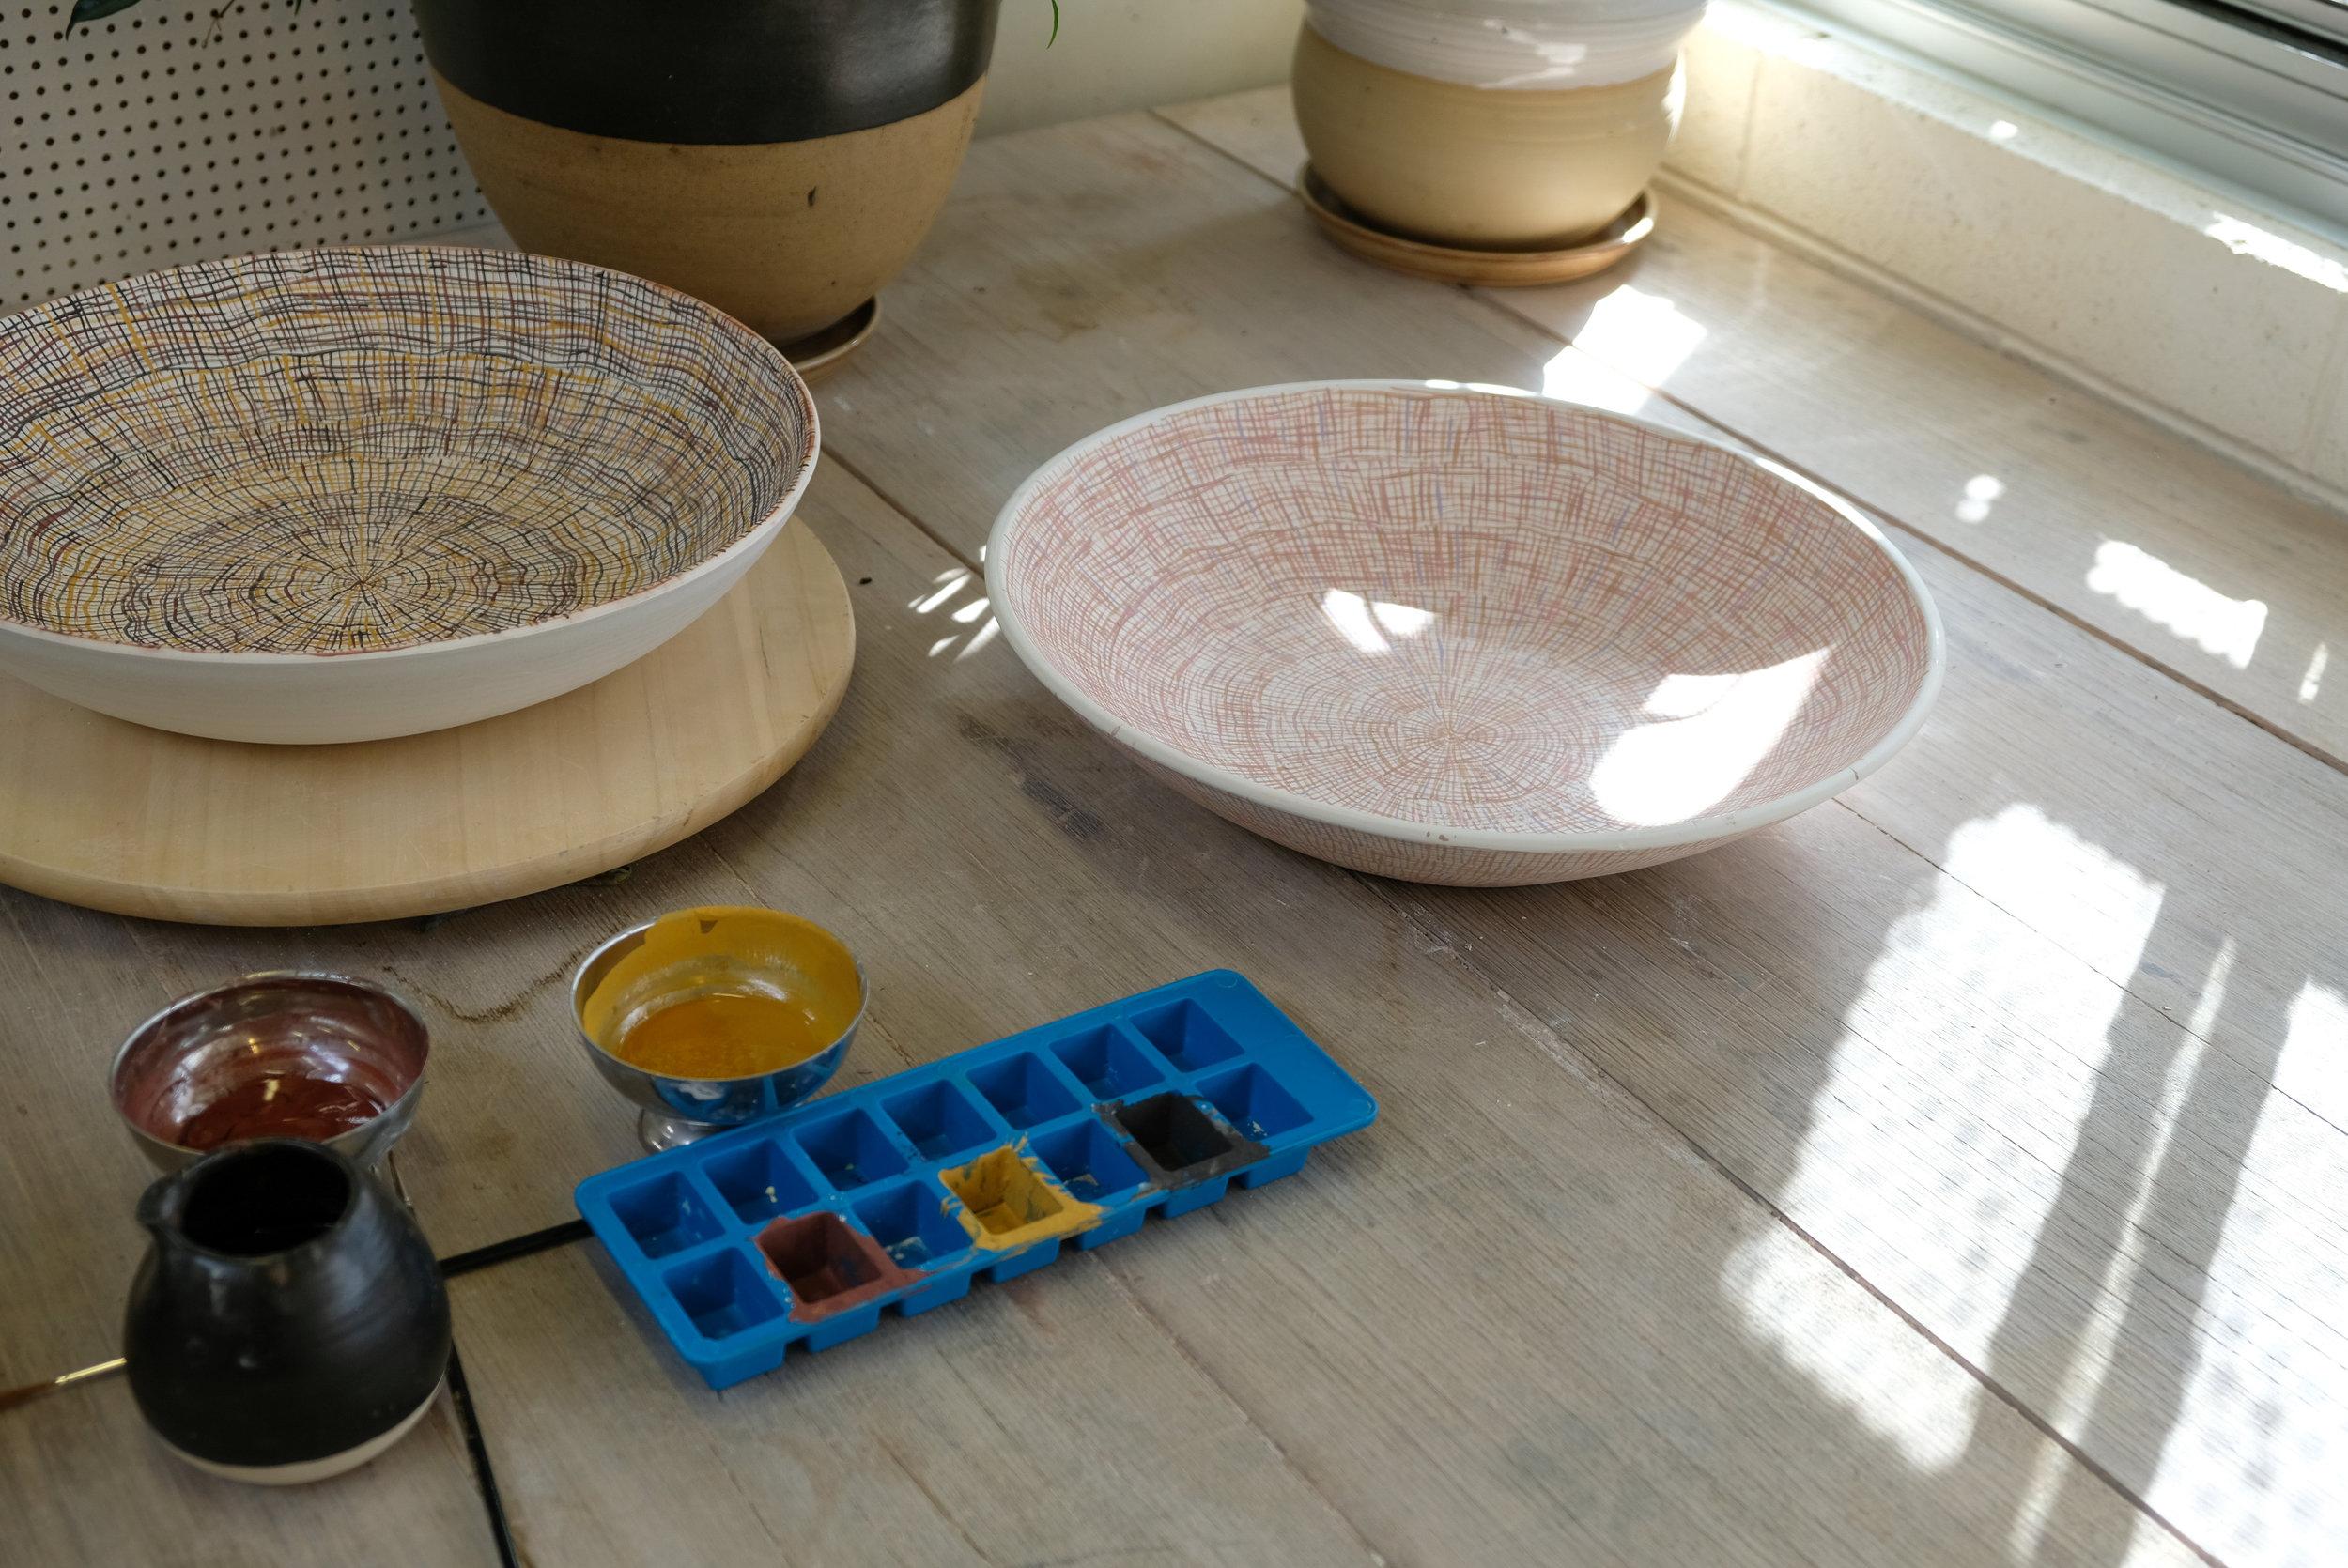 Translating weavings with ochre paint onto ceramic forms. Photo courtesy JamFactory